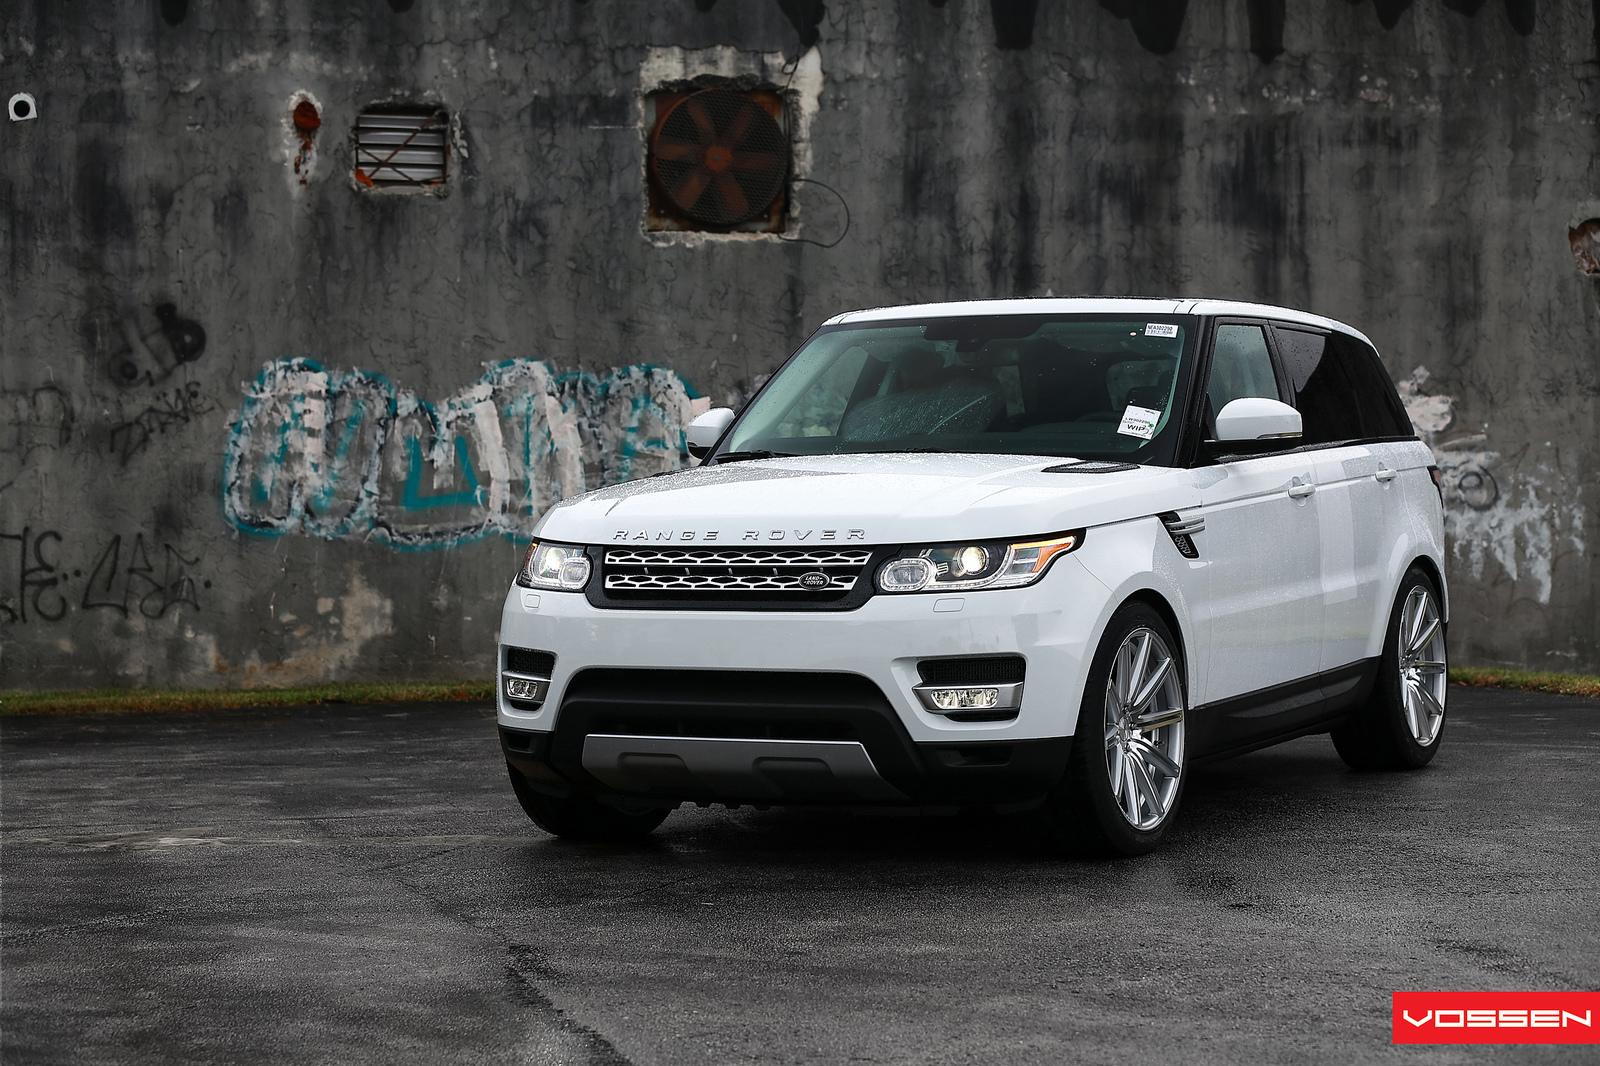 Range Rover Evoke >> 2014 Range Rover Sport Gets Vossen Wheels - autoevolution